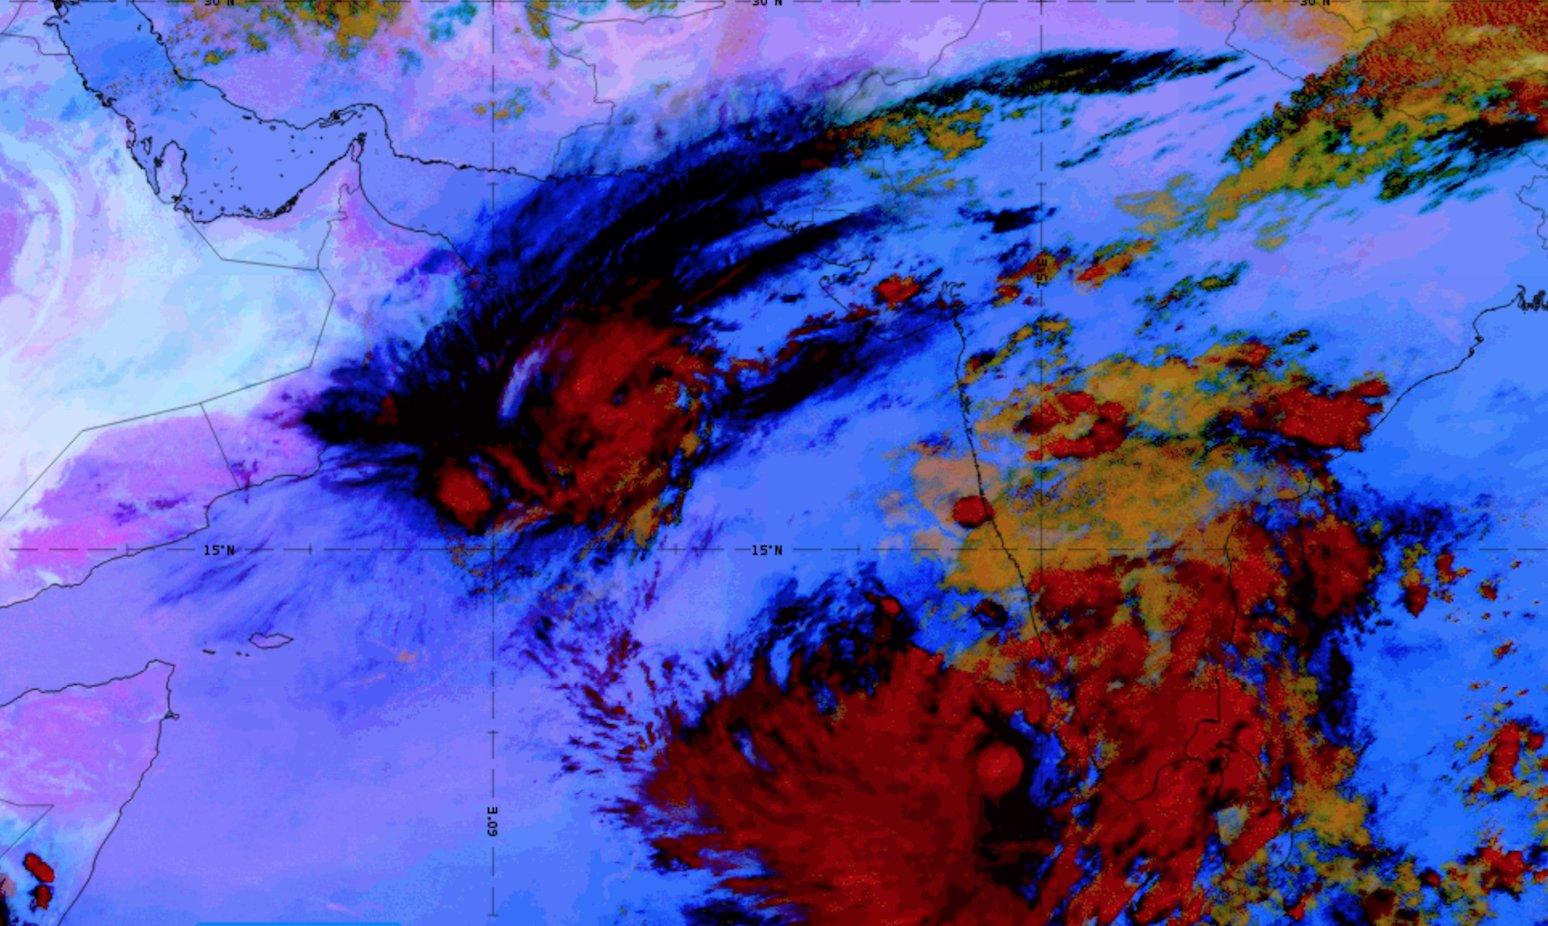 Metosat-8 Dust RGB, 30 Oct 15:00 UTC shows the drifting high level cirrus cloud